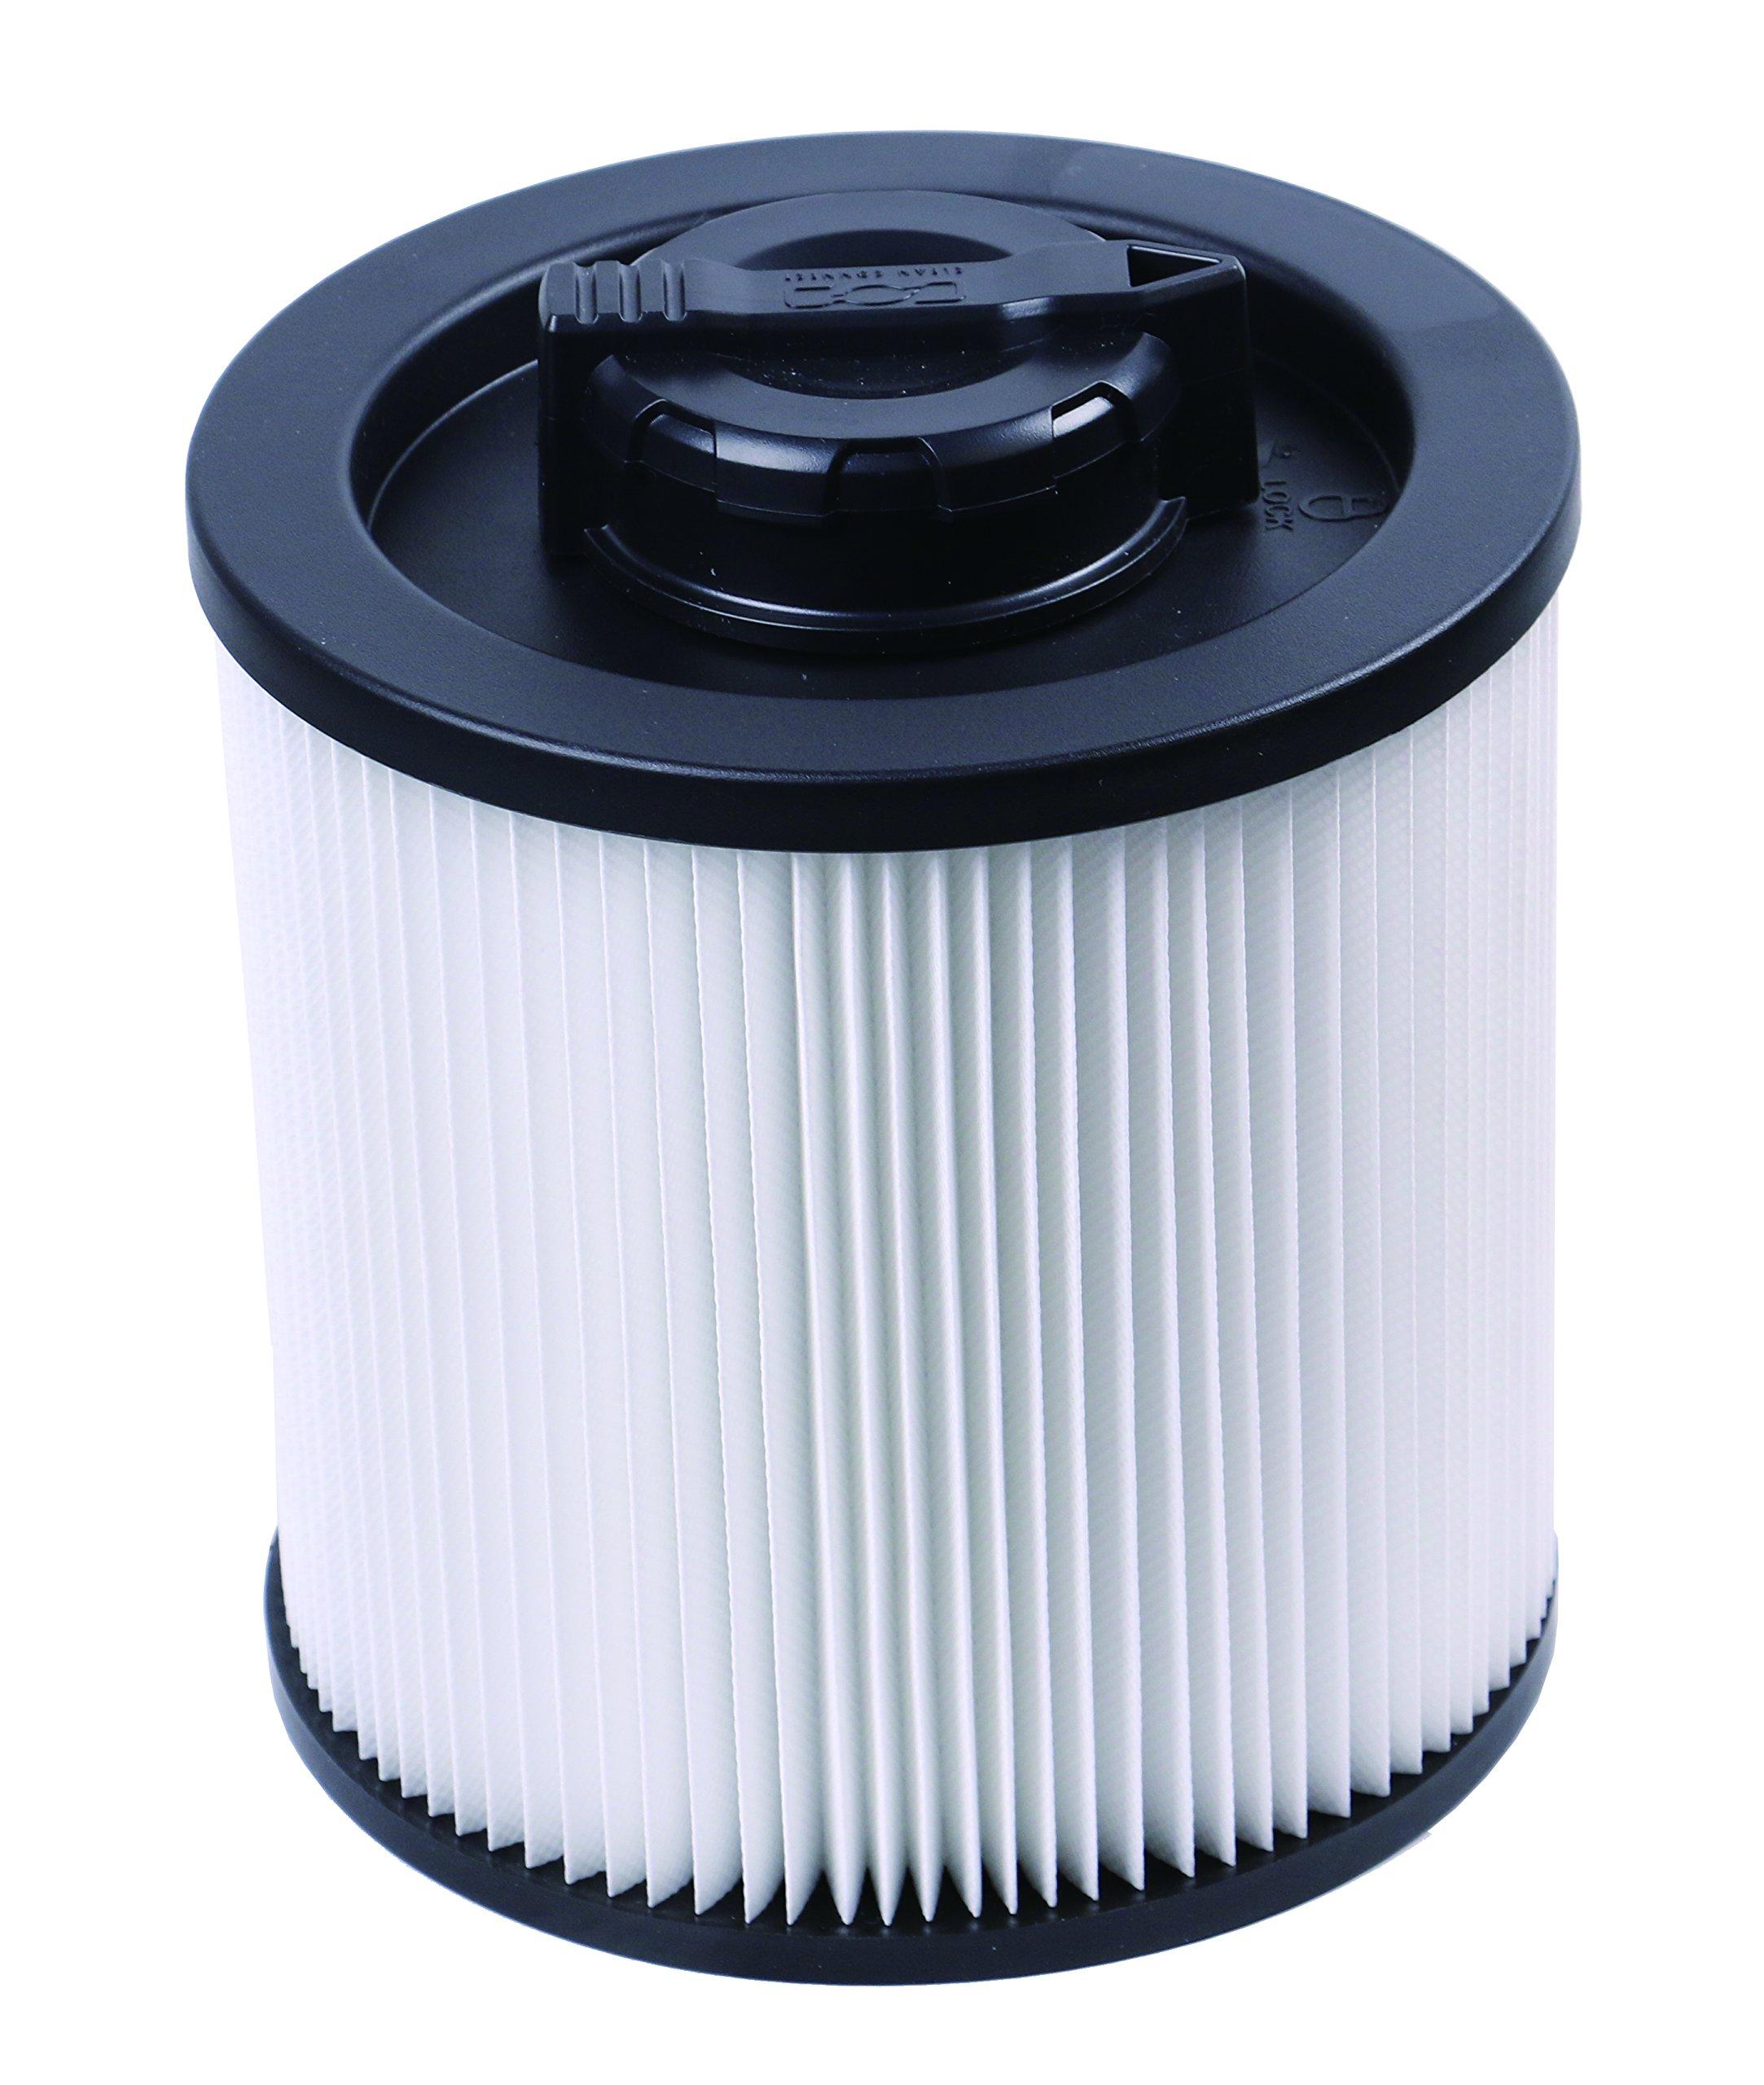 DeWALT Cartridge Filter- Regular 6-16 gal. by DEWALT